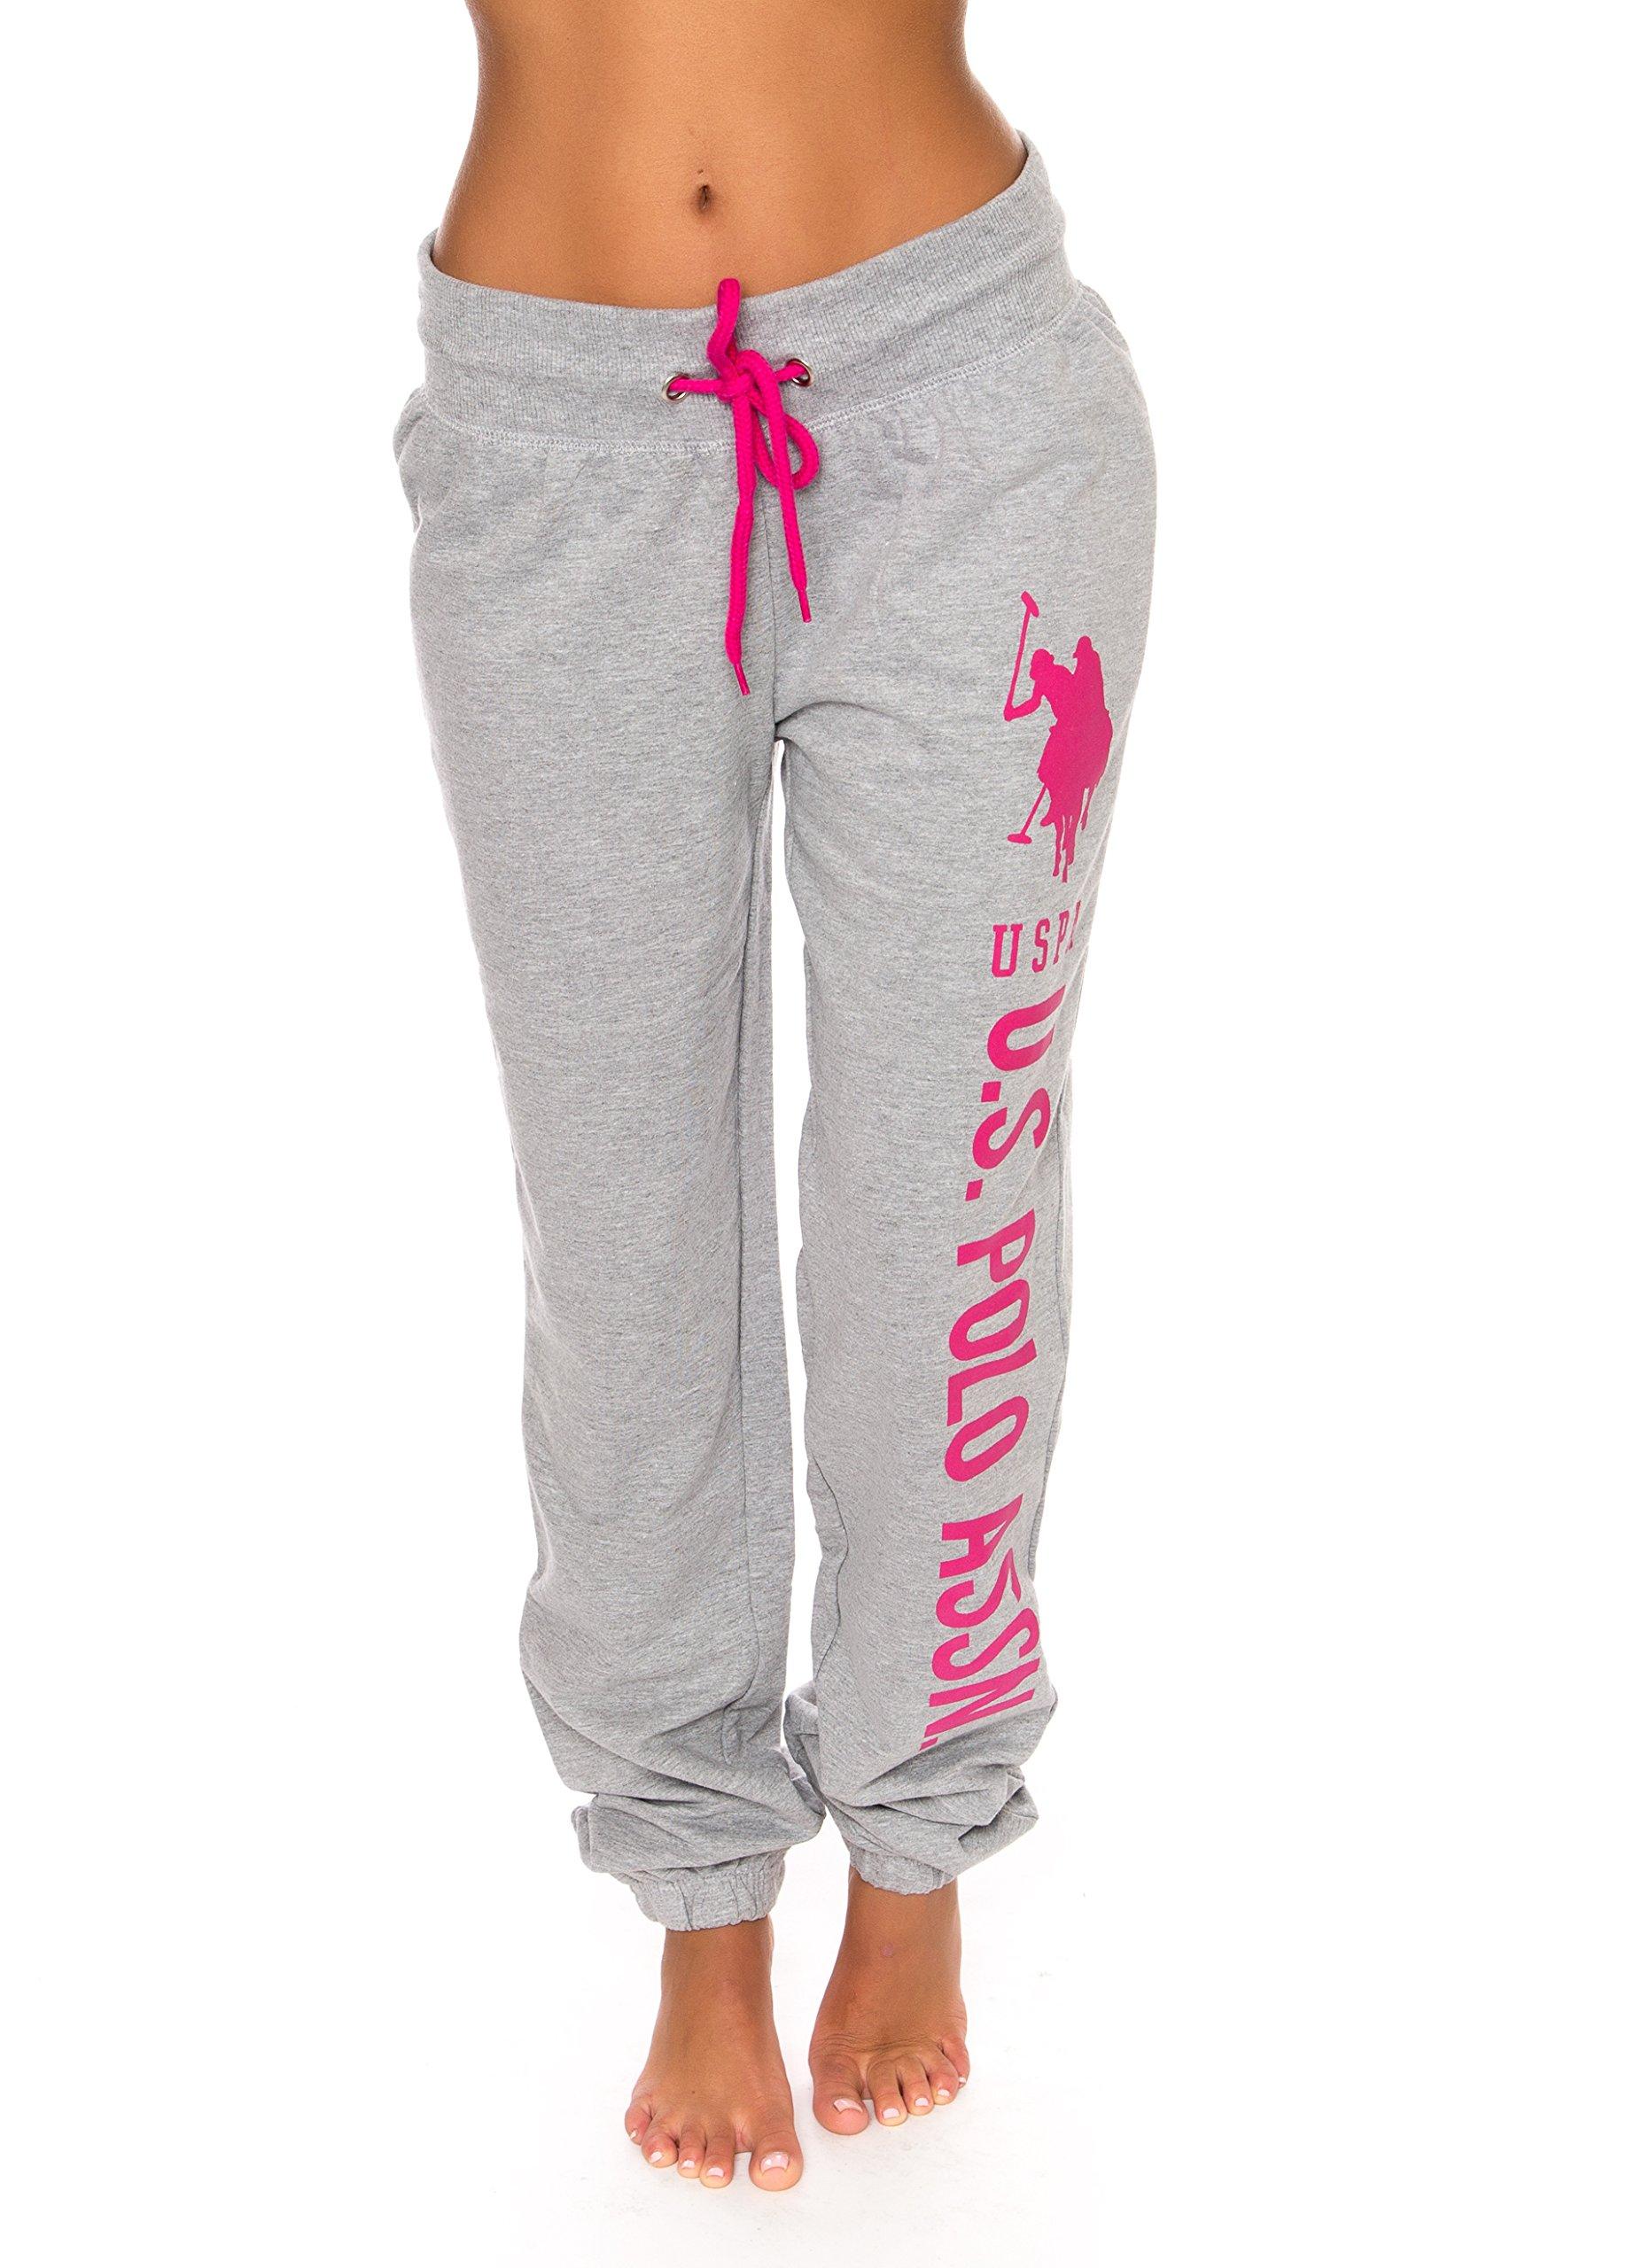 U.S. Polo Assn. Womens Printed French Terry Boyfriend Jogger Sweatpants Heather Grey 2X-Large Plus Size